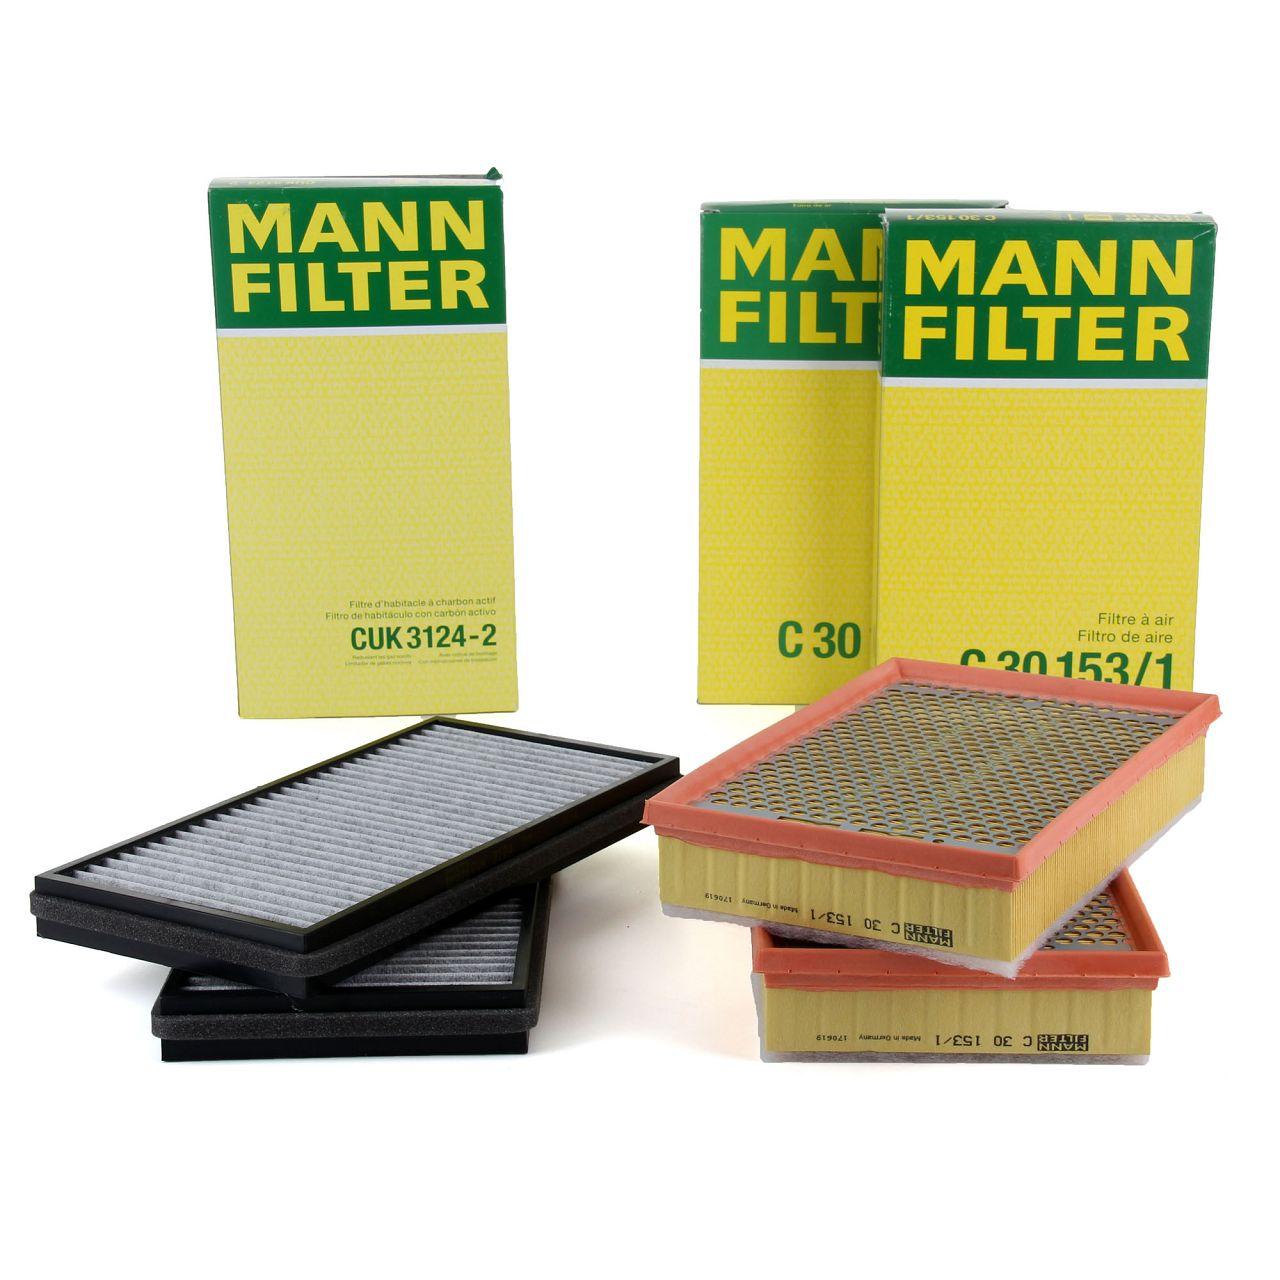 MANN Inspektionskit Filterpaket für BMW 7er E65 E66 E67 750i 760i 740d 745d